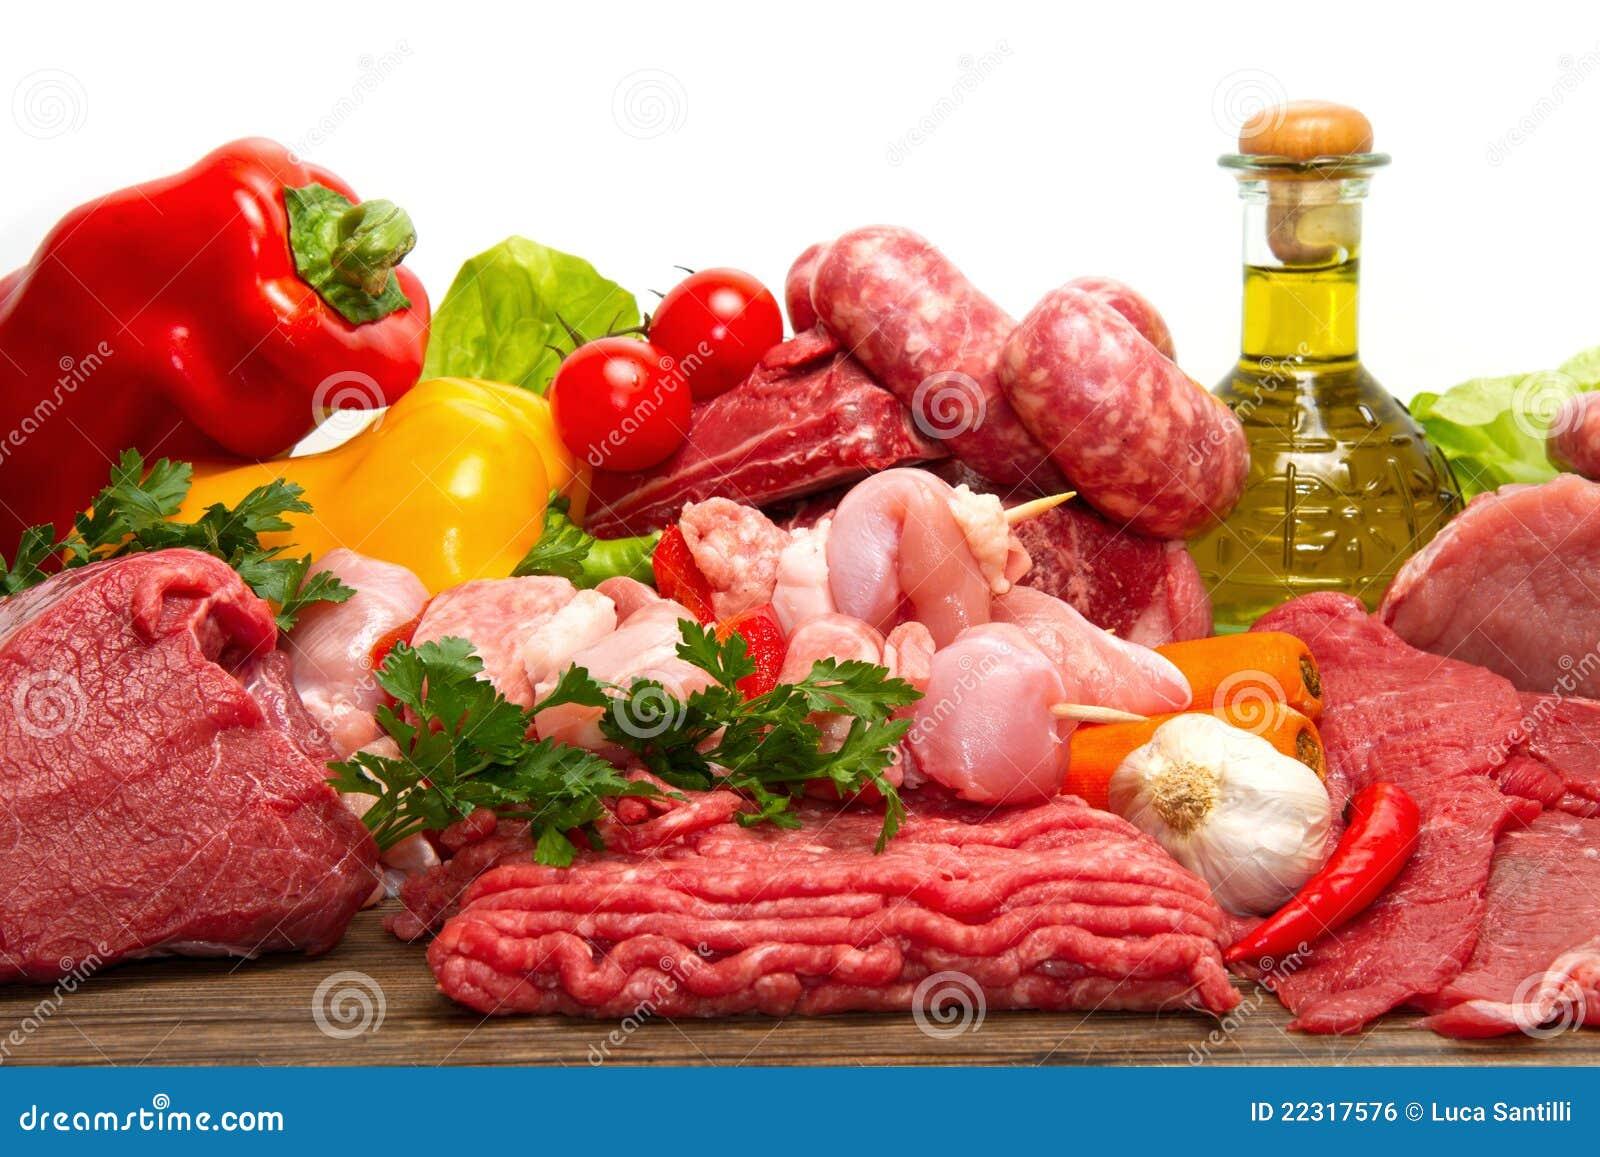 мясо сырцовое